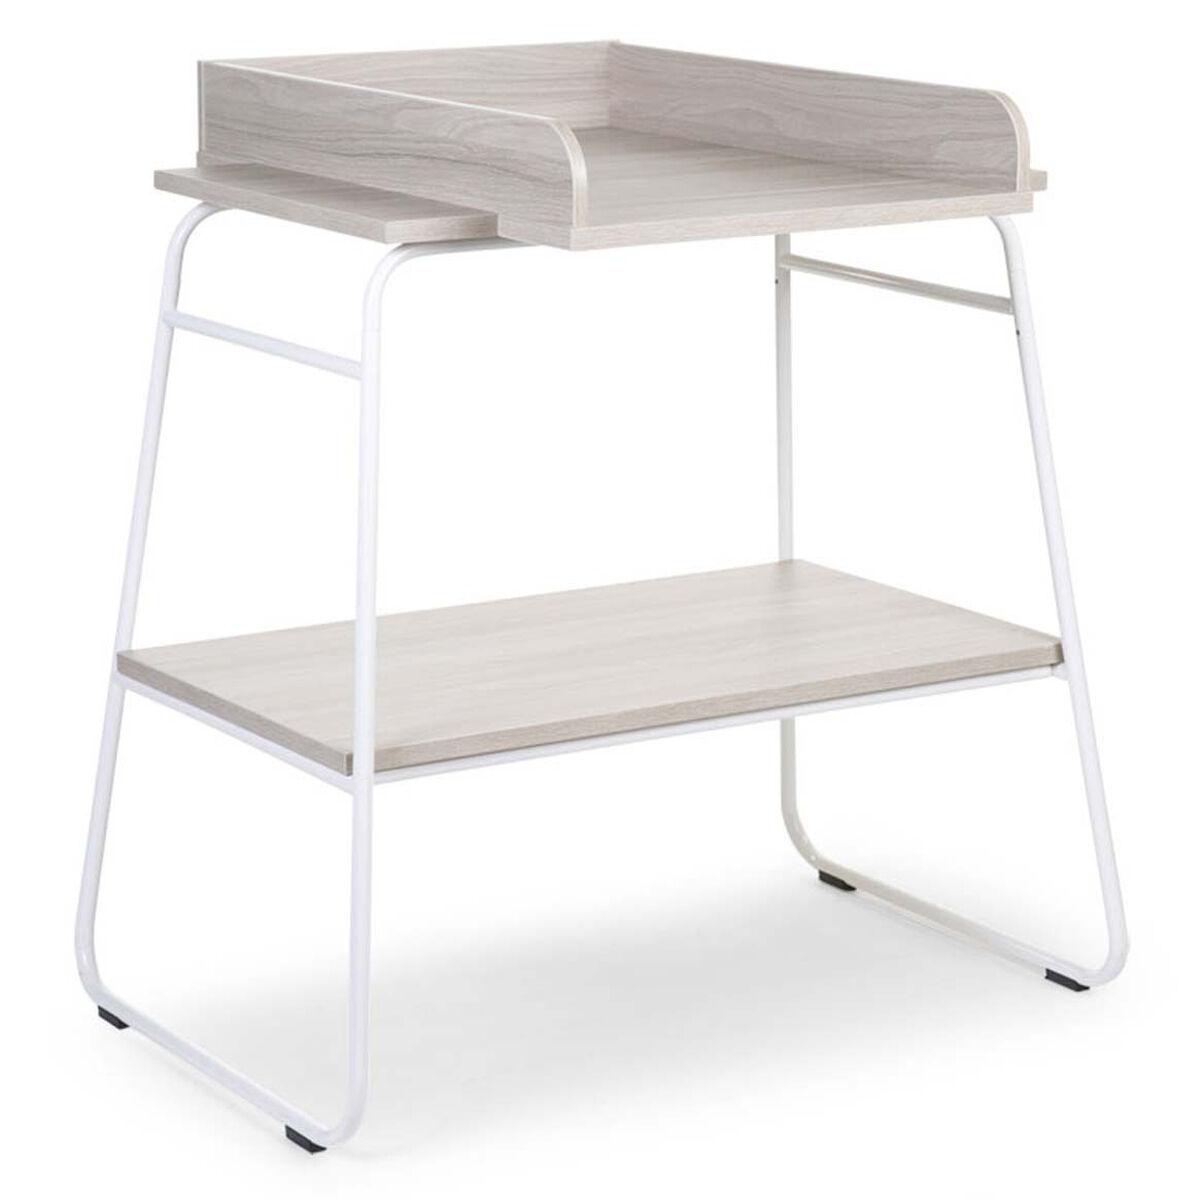 Childhome Table à Langer Ironwood Large - Ashen et Blanc